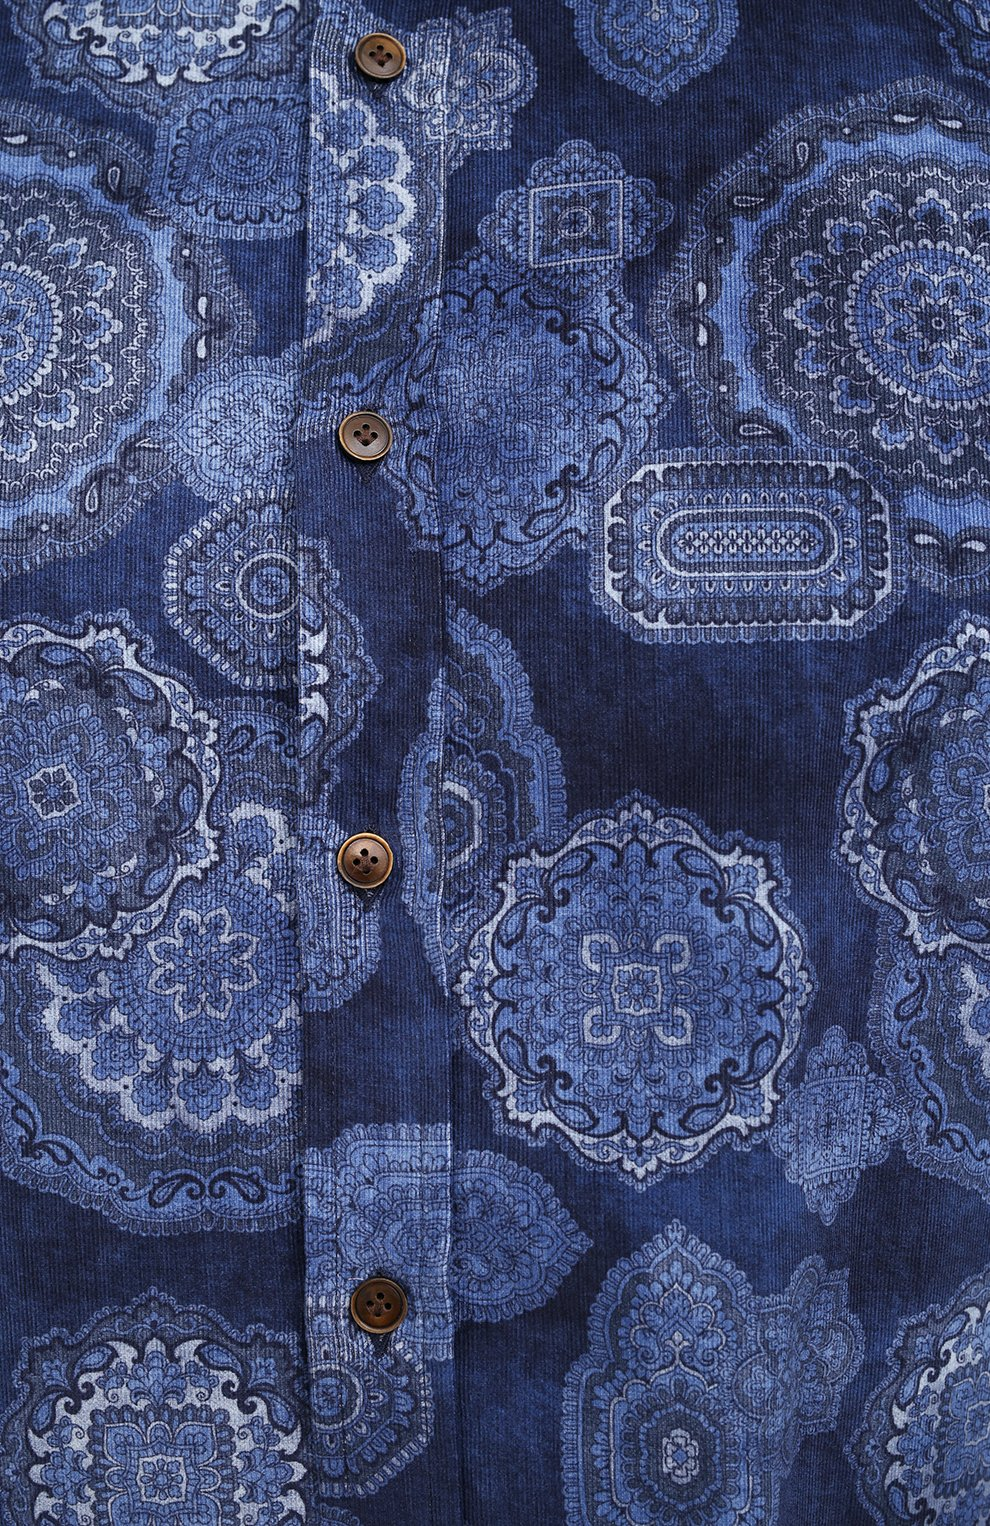 Мужская хлопковая рубашка SONRISA синего цвета, арт. IL4VE/BC/LV1108/47-51 | Фото 5